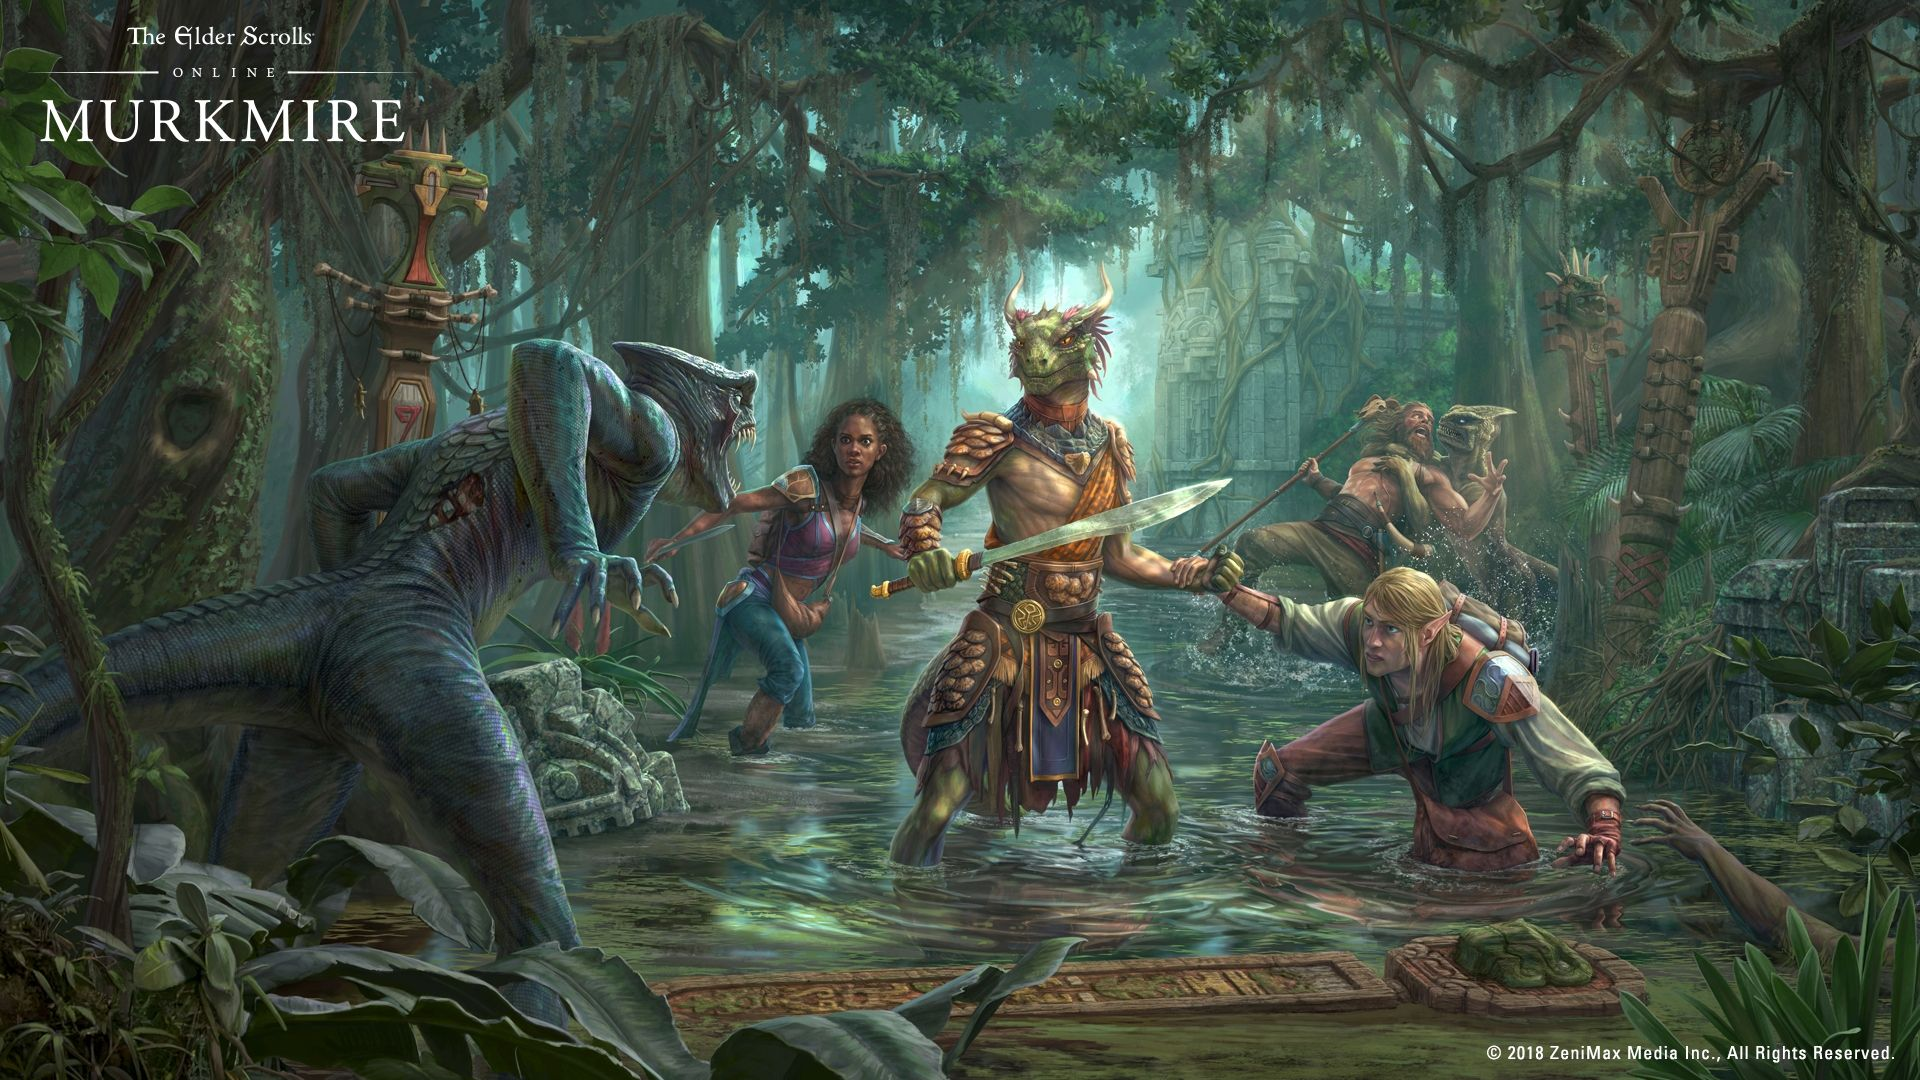 The Elder Scrolls Wallpapers Top Free The Elder Scrolls